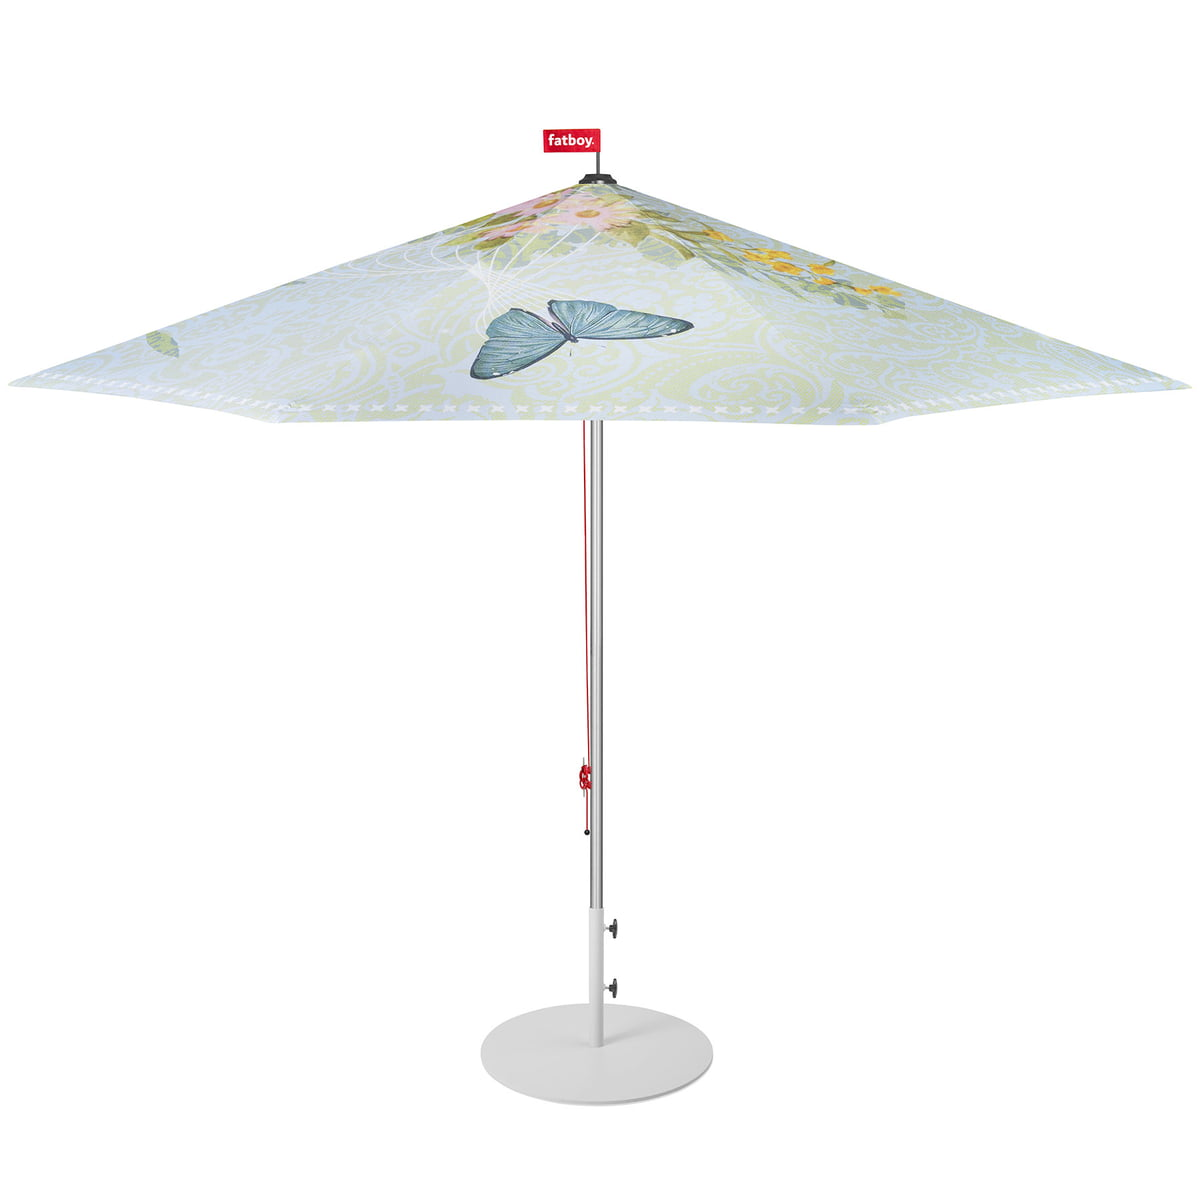 Buy the Bouqetteketet parasol by Fatboy